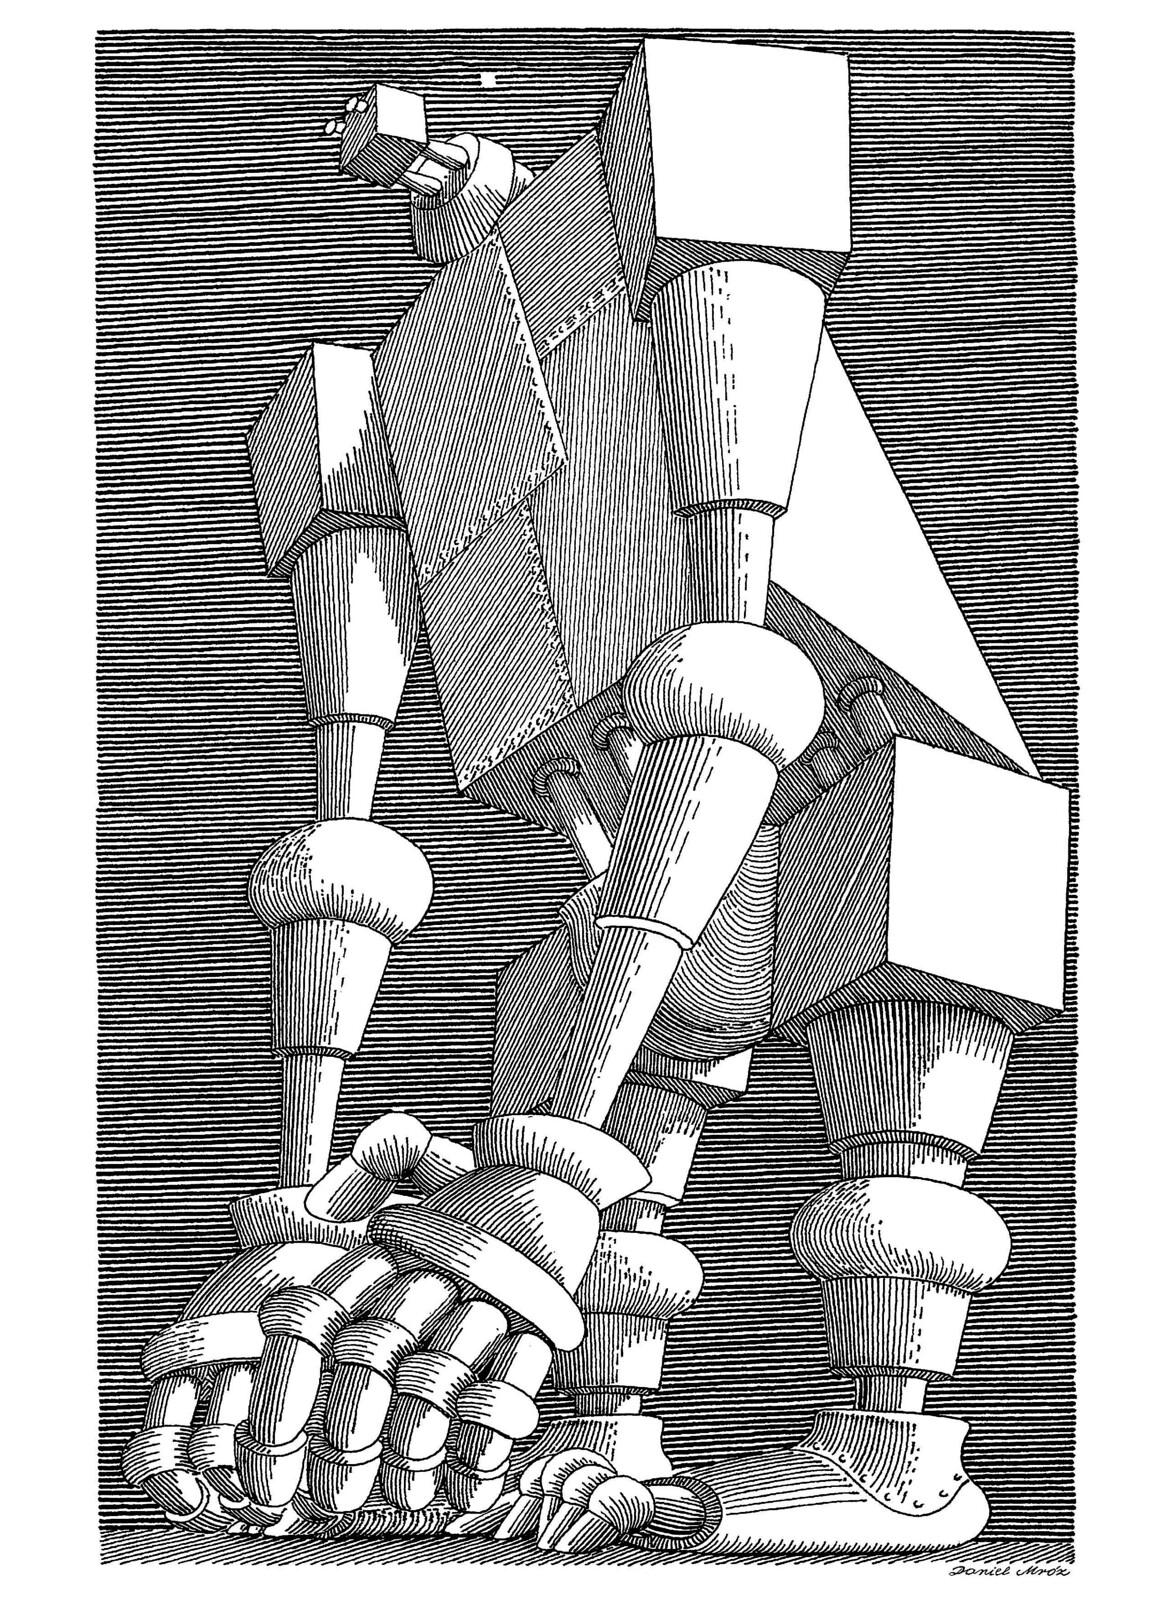 Daniel Mróz - Artwork 4